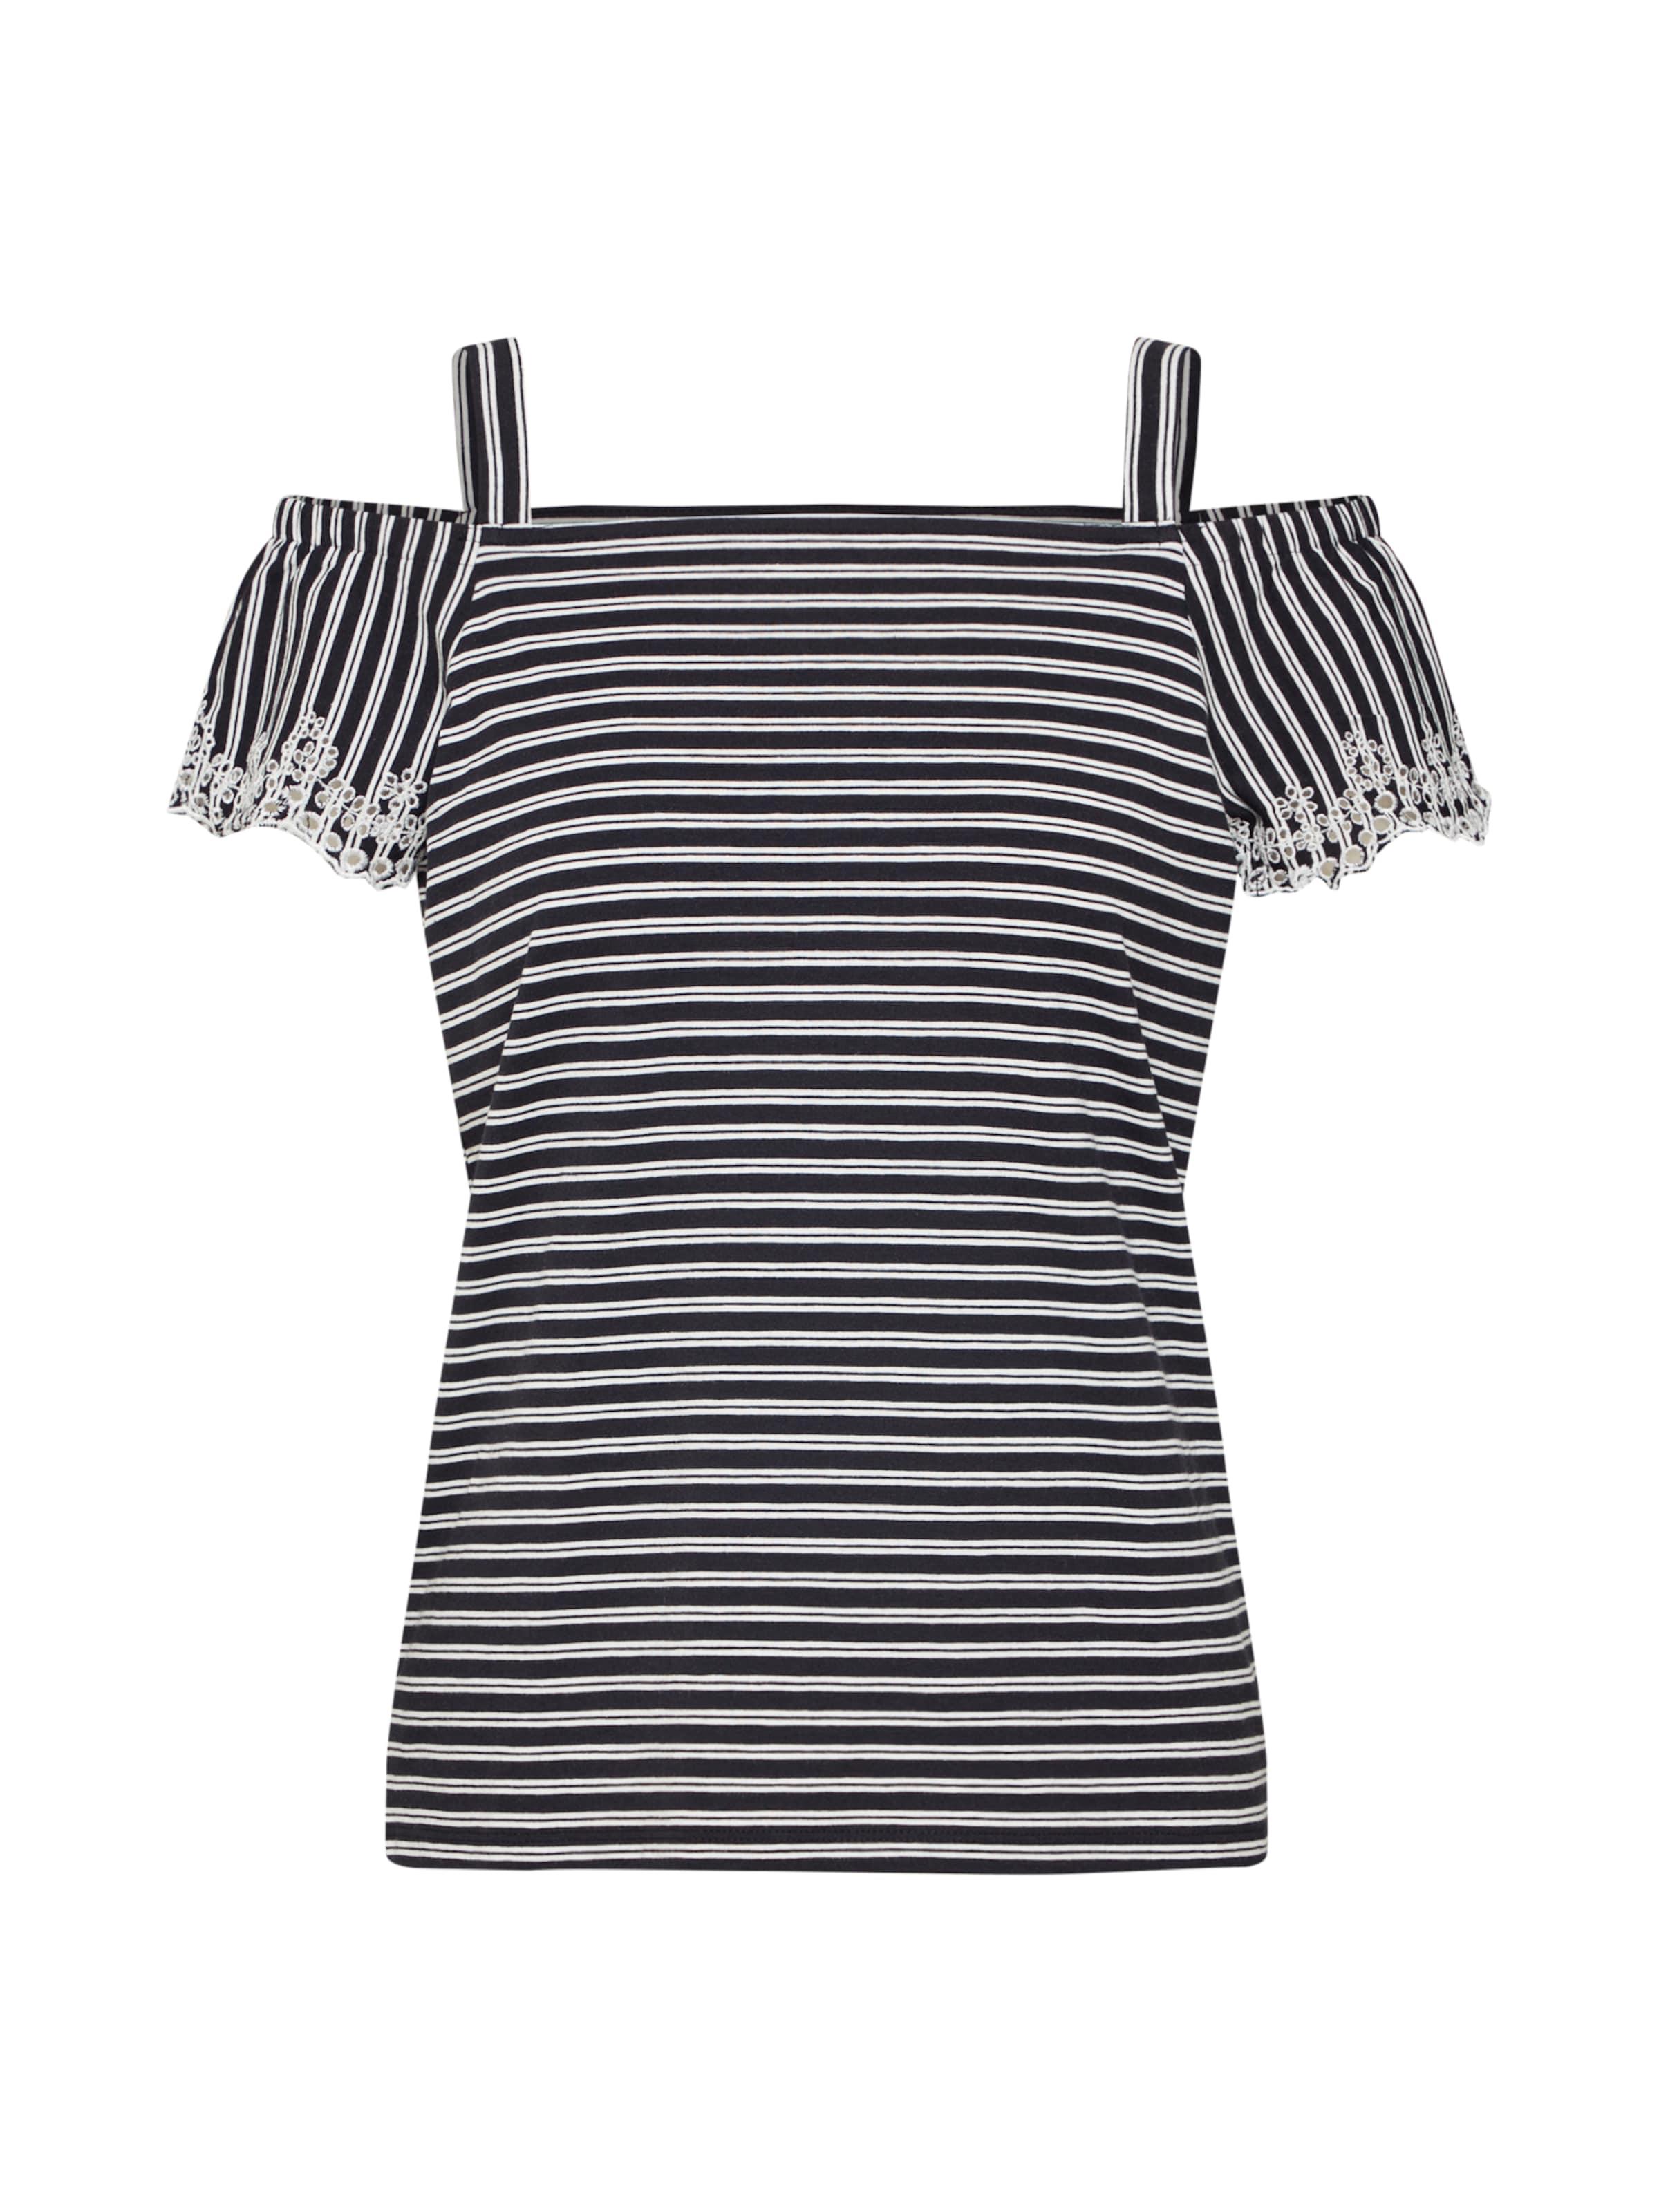 En Tee' Noir 'carmen shirt T Esprit yv8nNOwm0